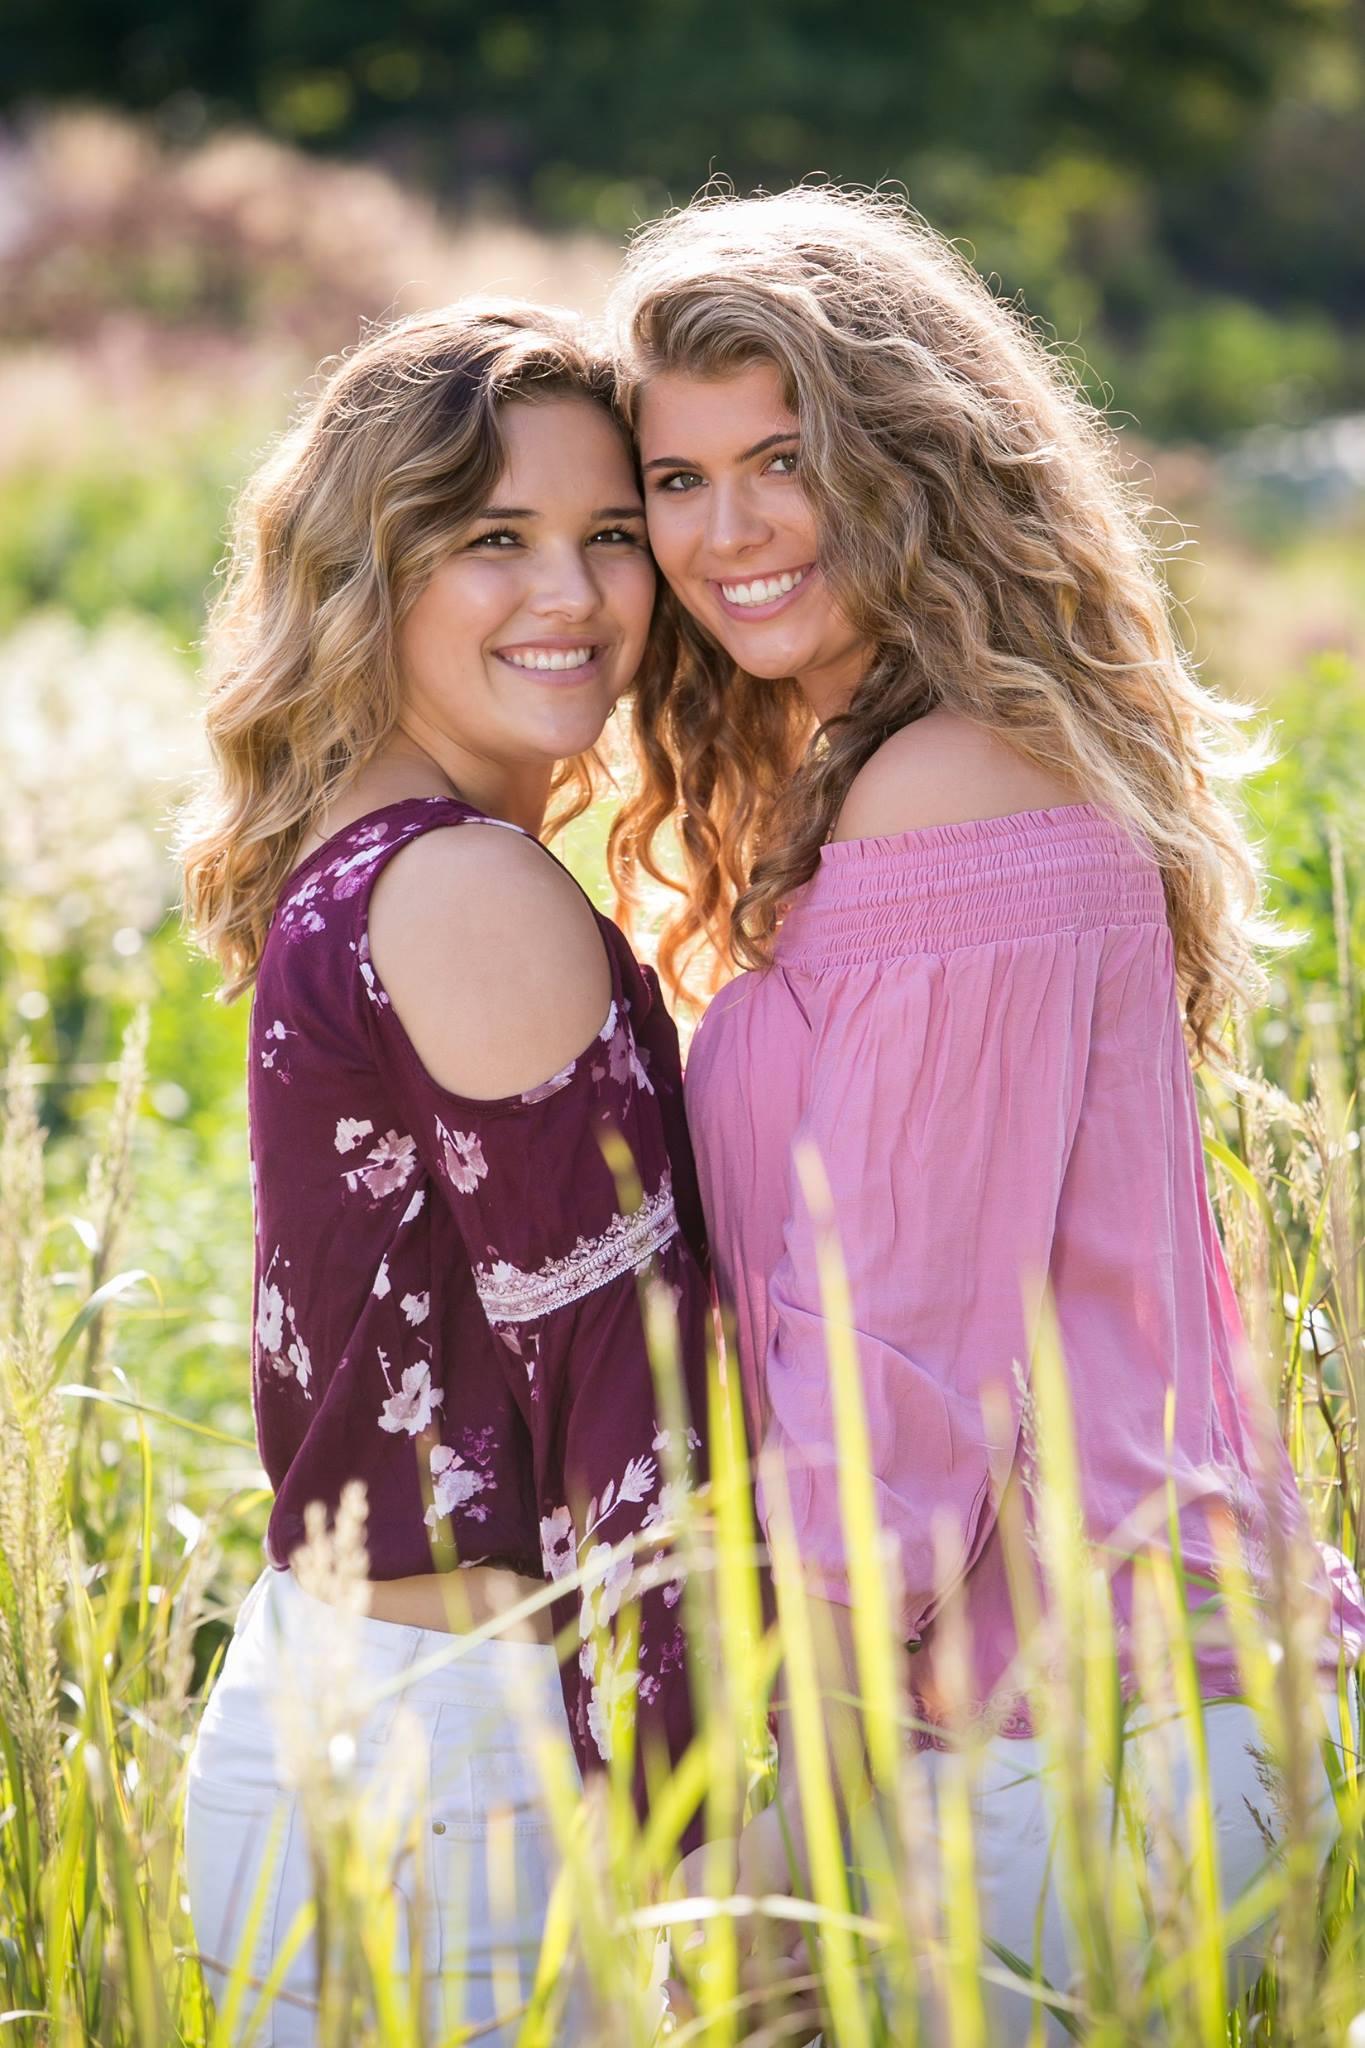 Best Friends Senior Portraits